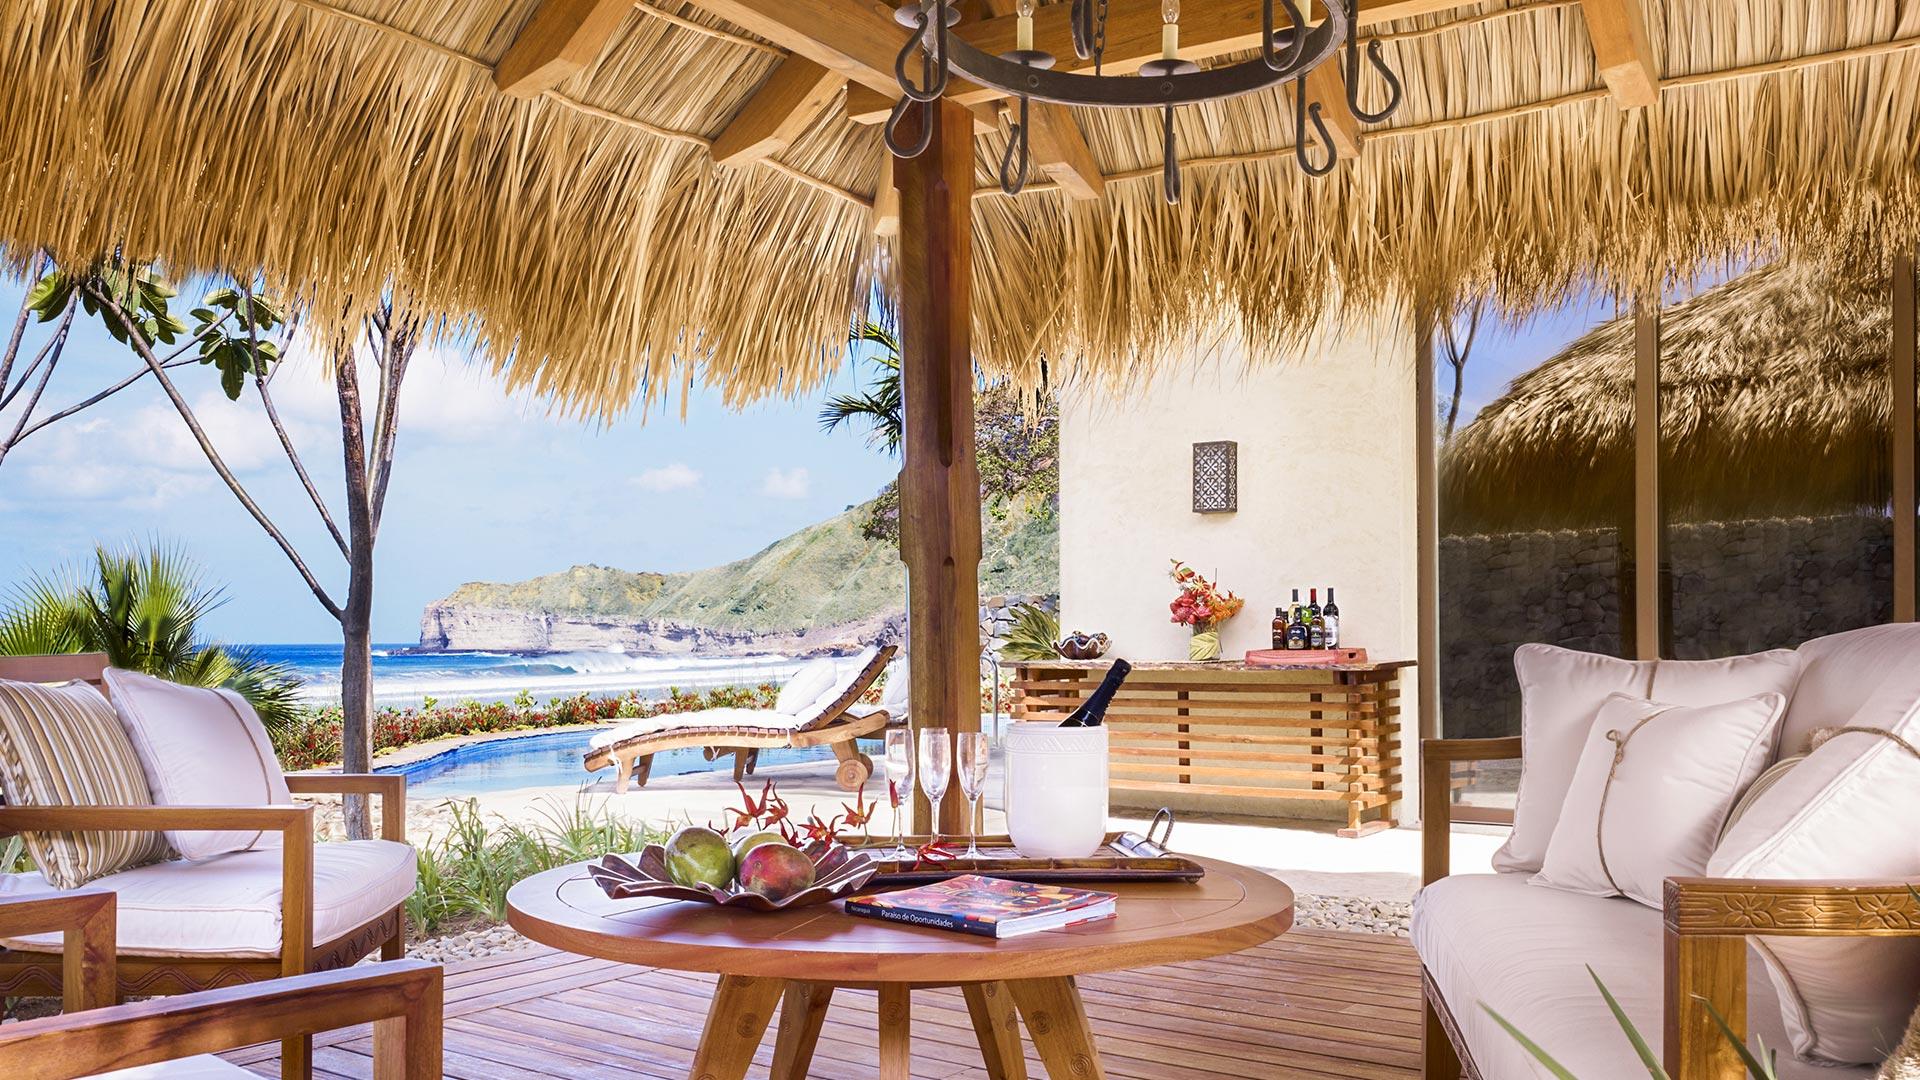 SouthAmerica_Nicaragua_Mukul_Pool_VillaTerrace.jpg